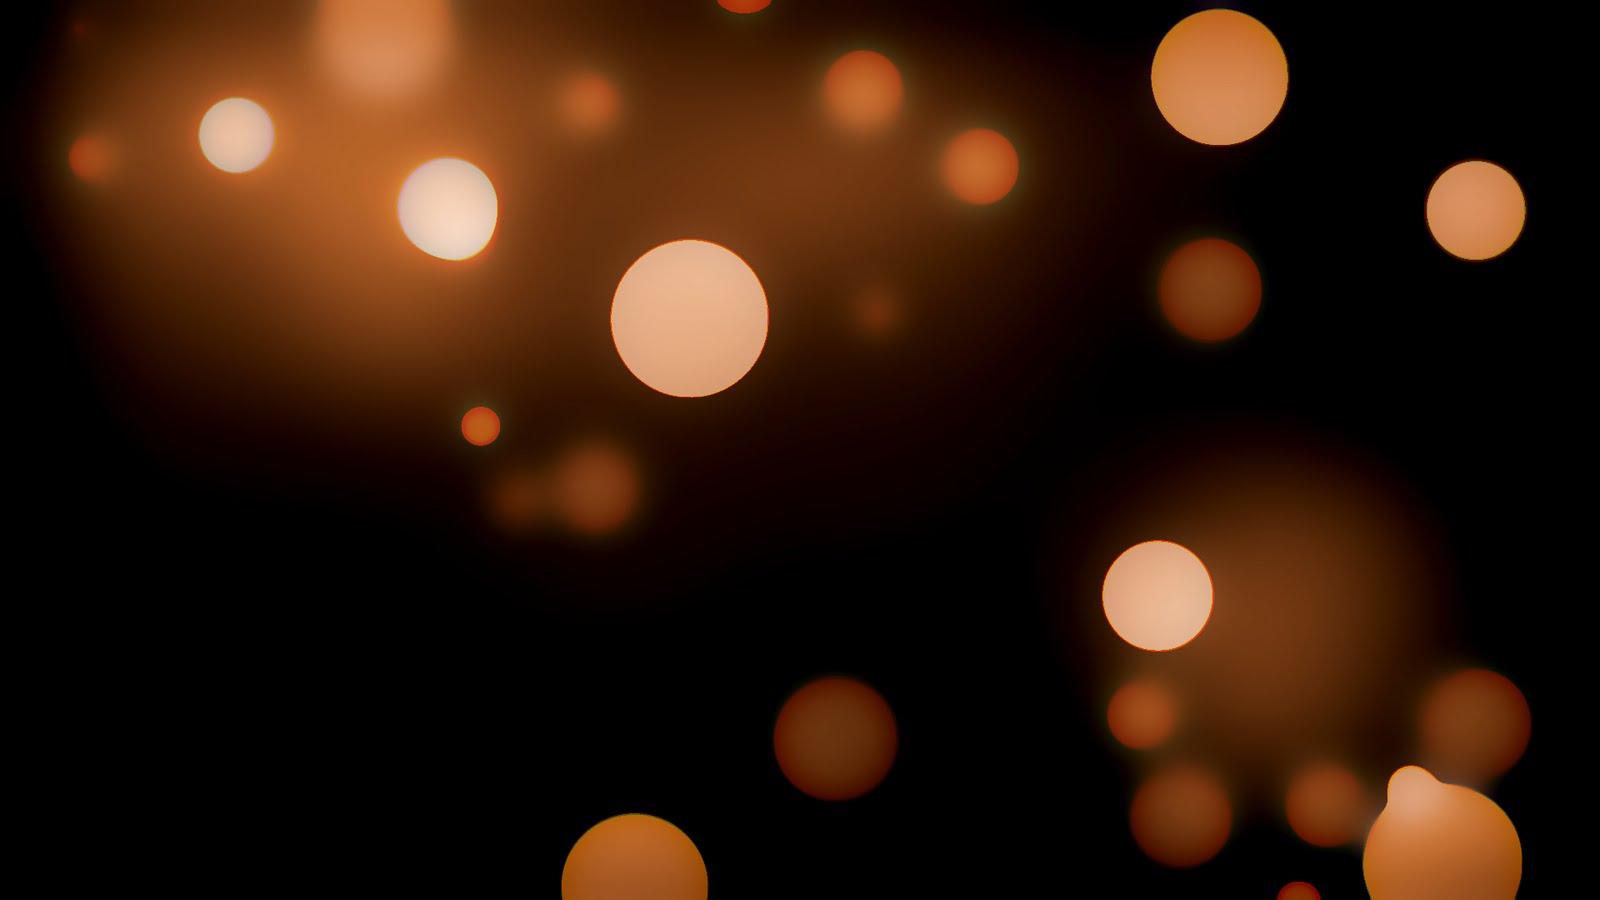 http://4.bp.blogspot.com/_JCQ5hN4awUg/SwGyK06NzSI/AAAAAAAAAVM/wY3NKxJ2m2w/s1600/115580-Bokeh-very-black-orange-.jpg